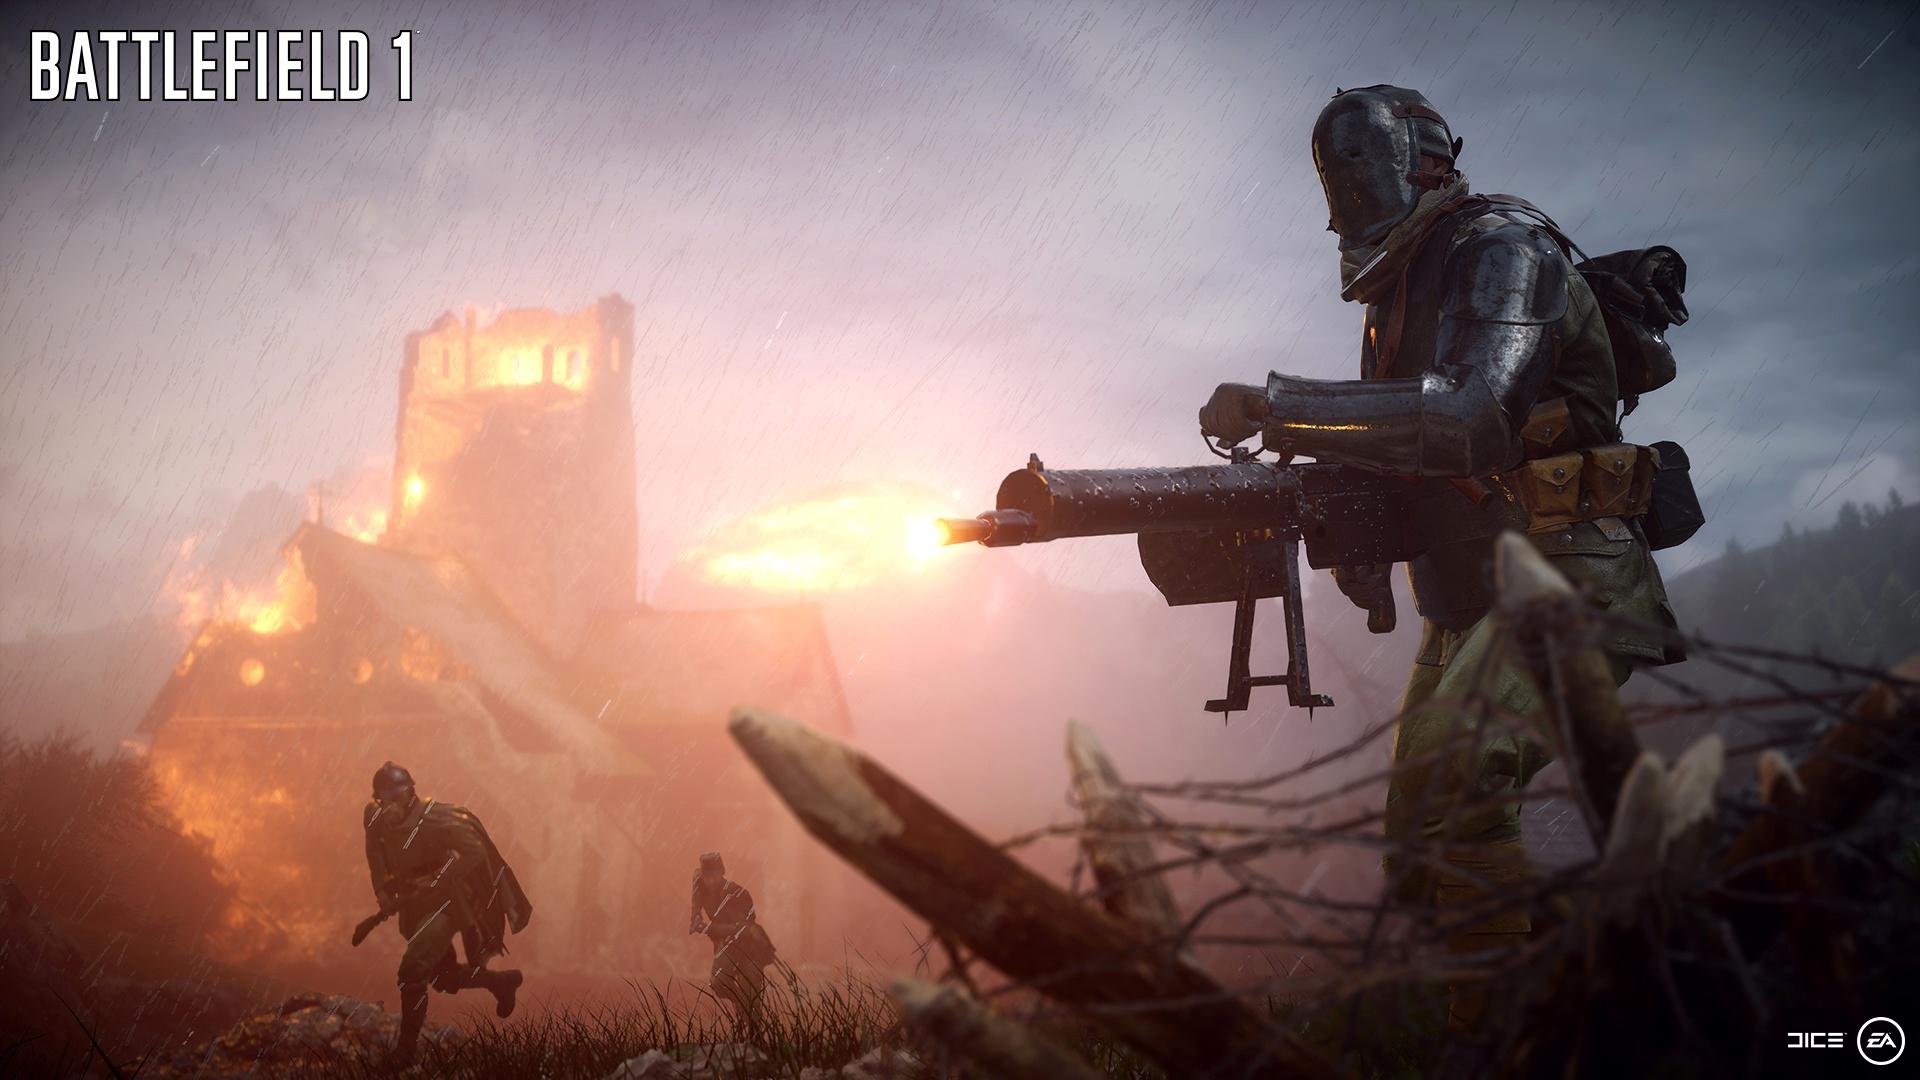 EAназвала дату старта бета-тестирования Battlefield 1